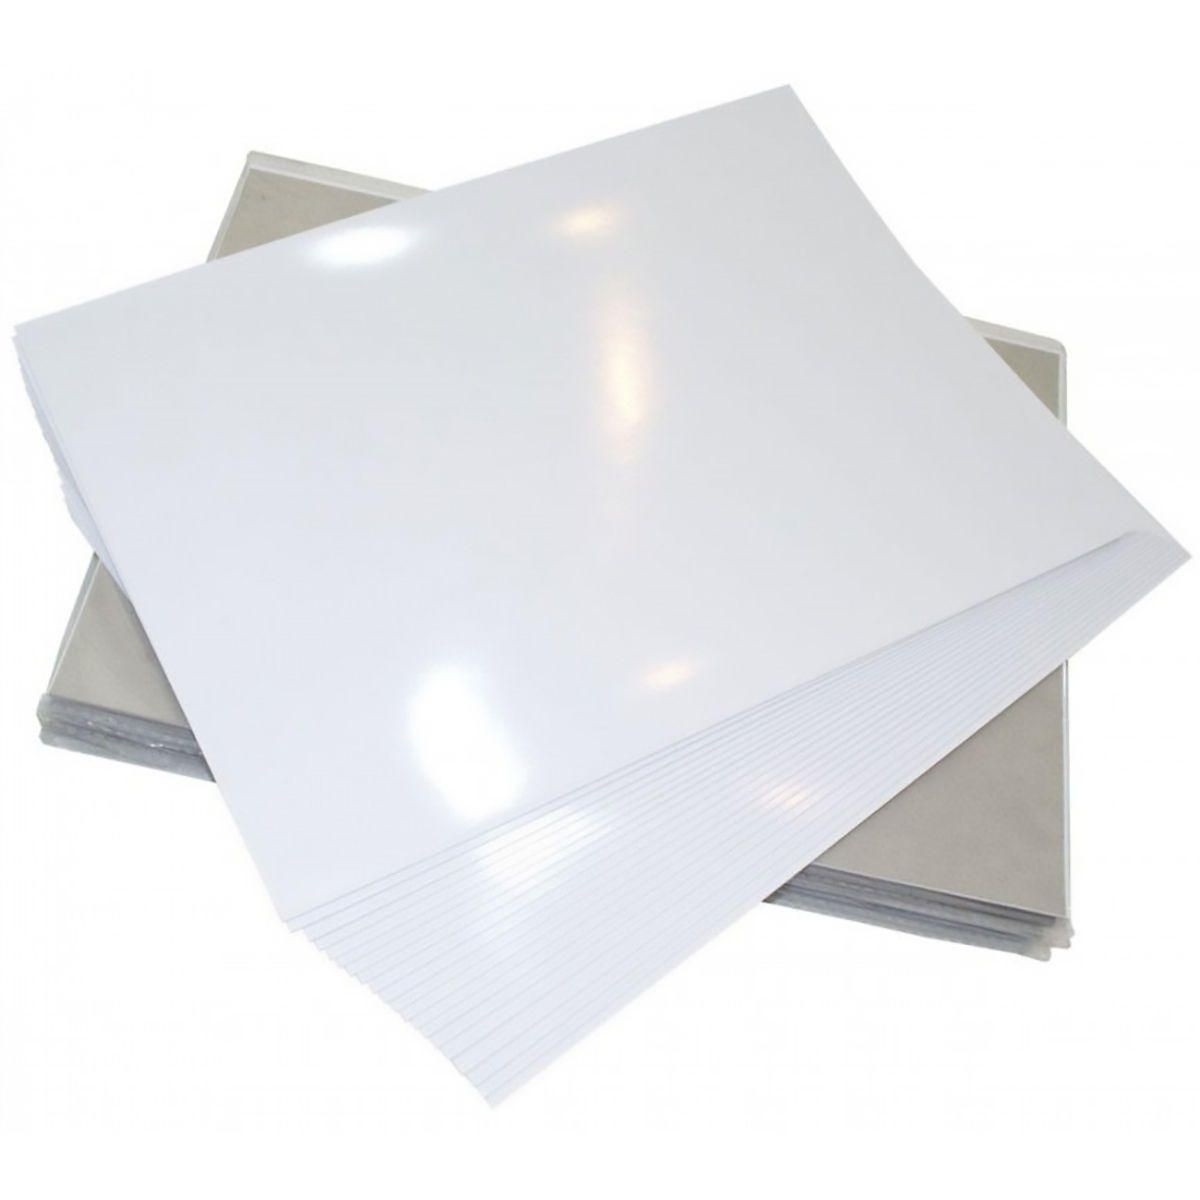 Papel Foto Adesivo A3 297mm x 420mm Fotográfico 130g Glossy Branco Brilhante / 20 Folhas